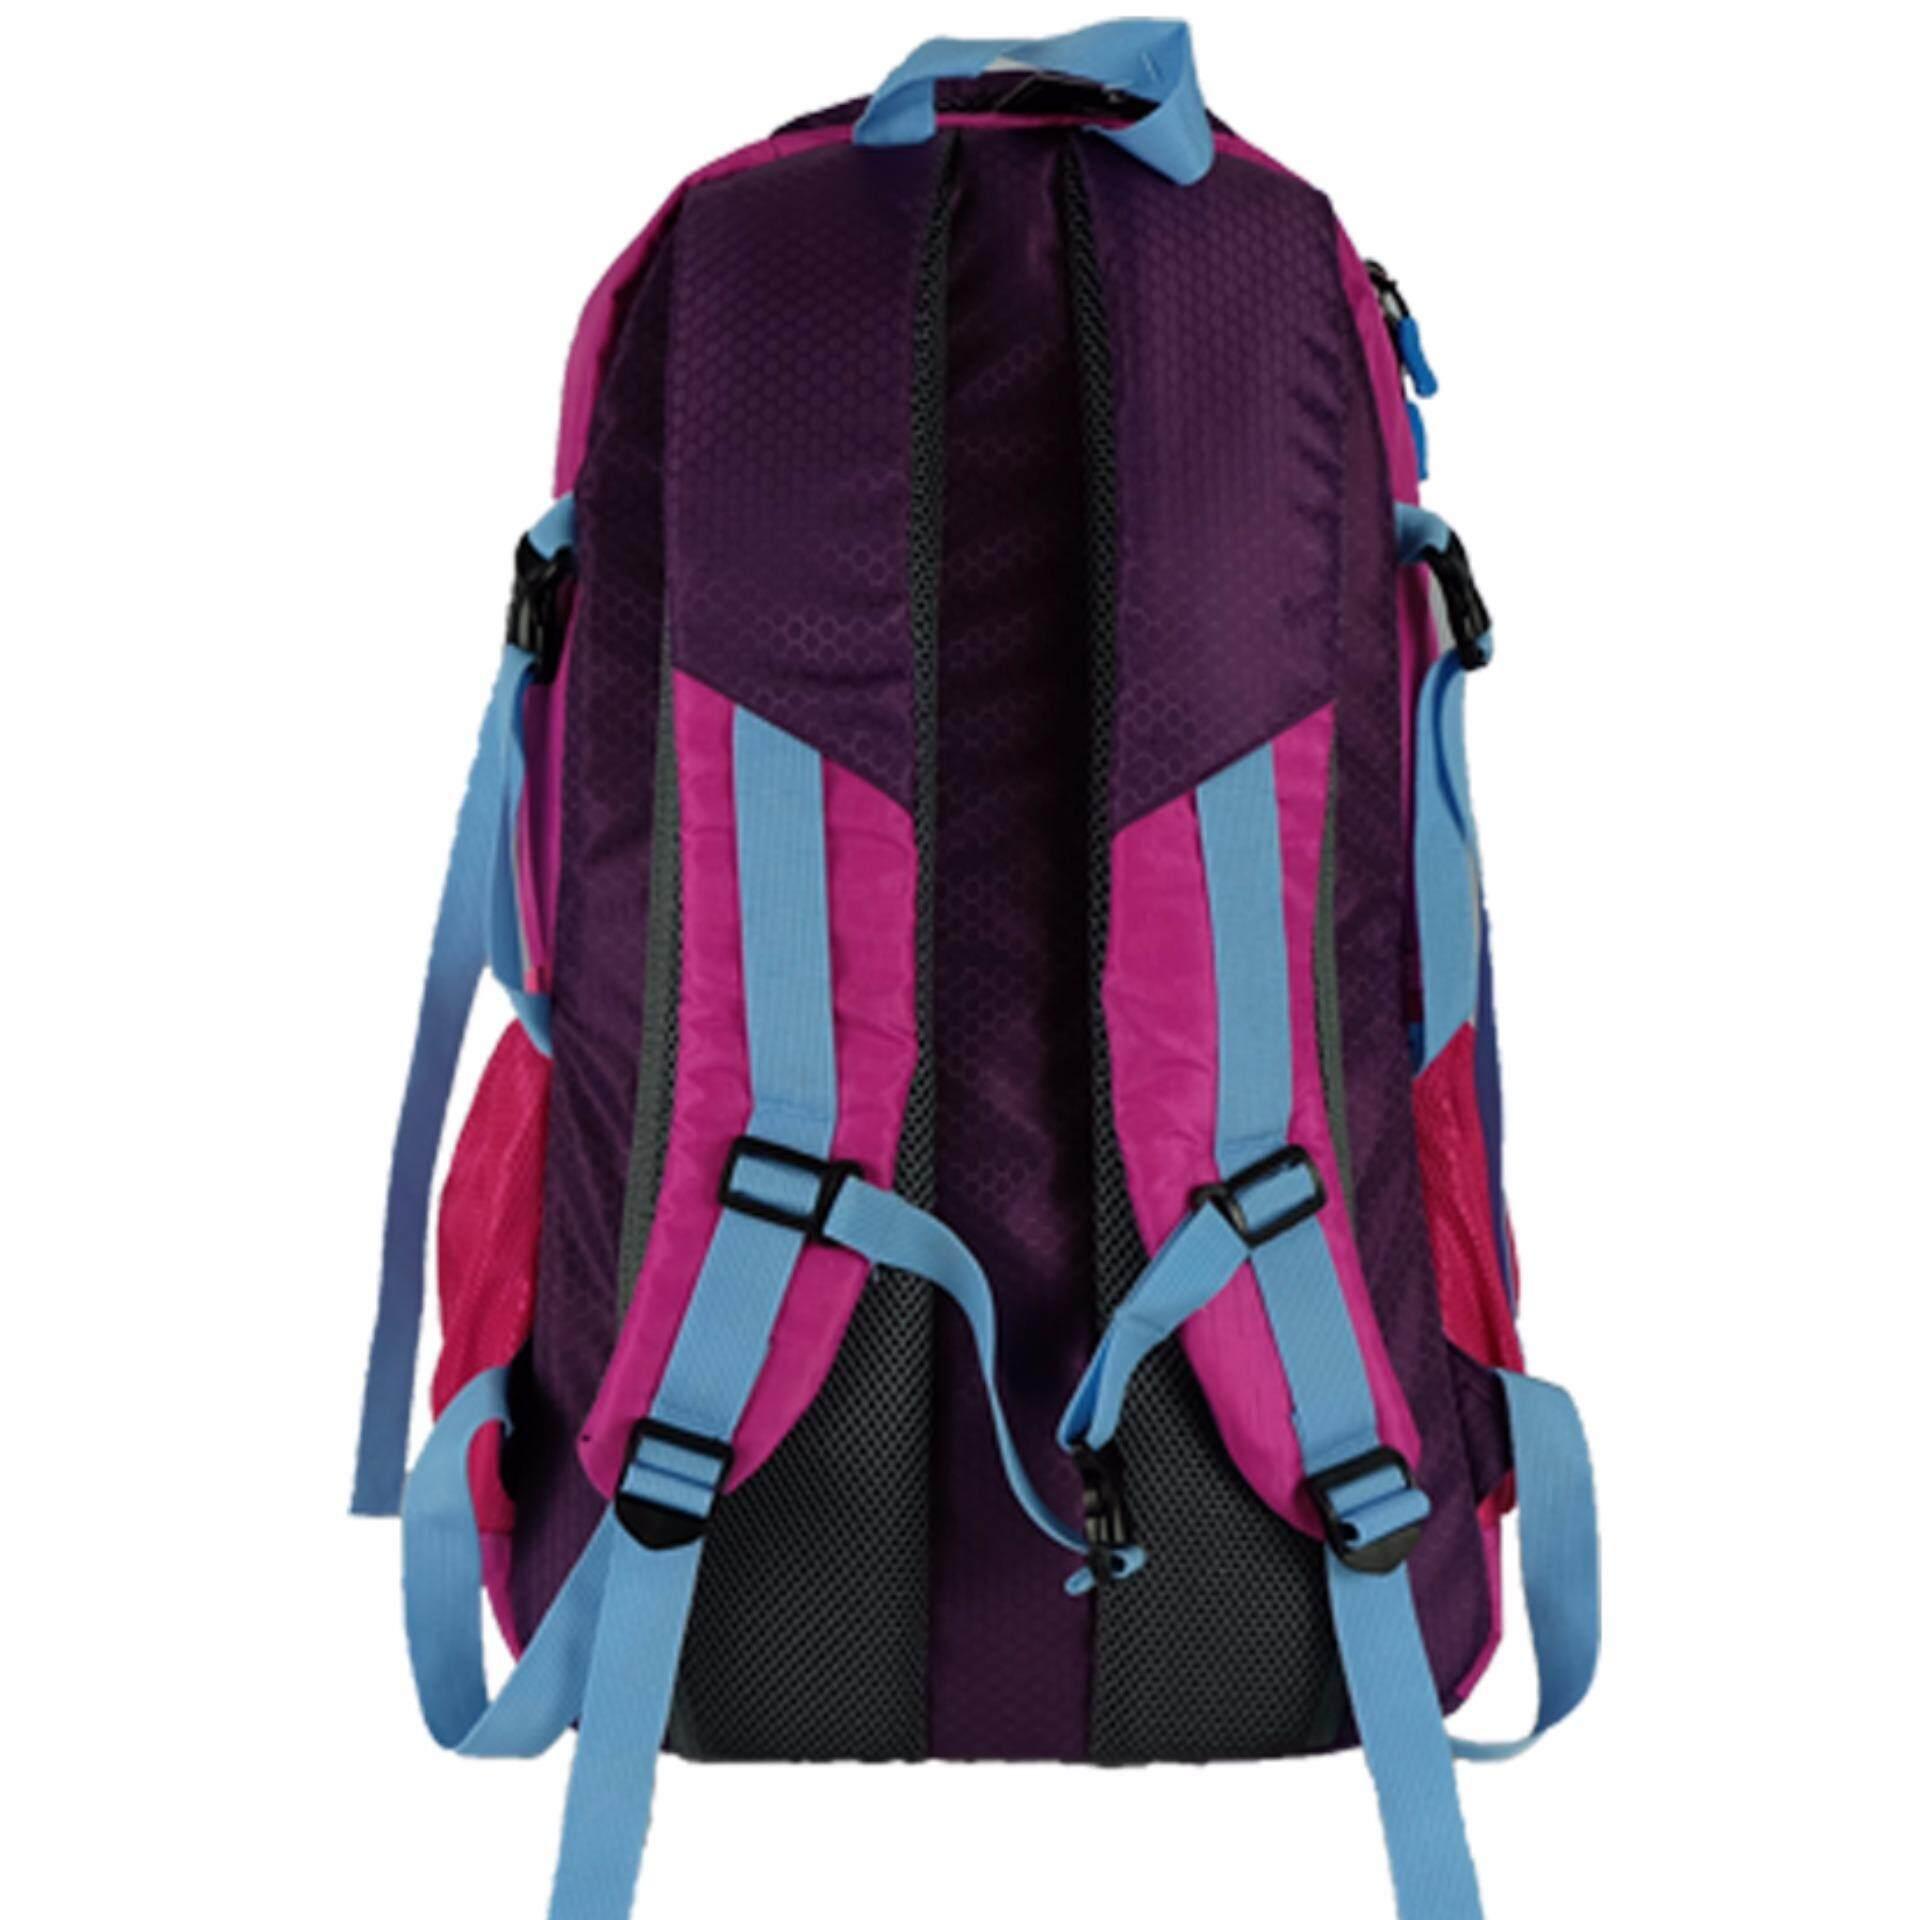 HH9613 Haitop 48L Hiking Backpack- Hot Pink